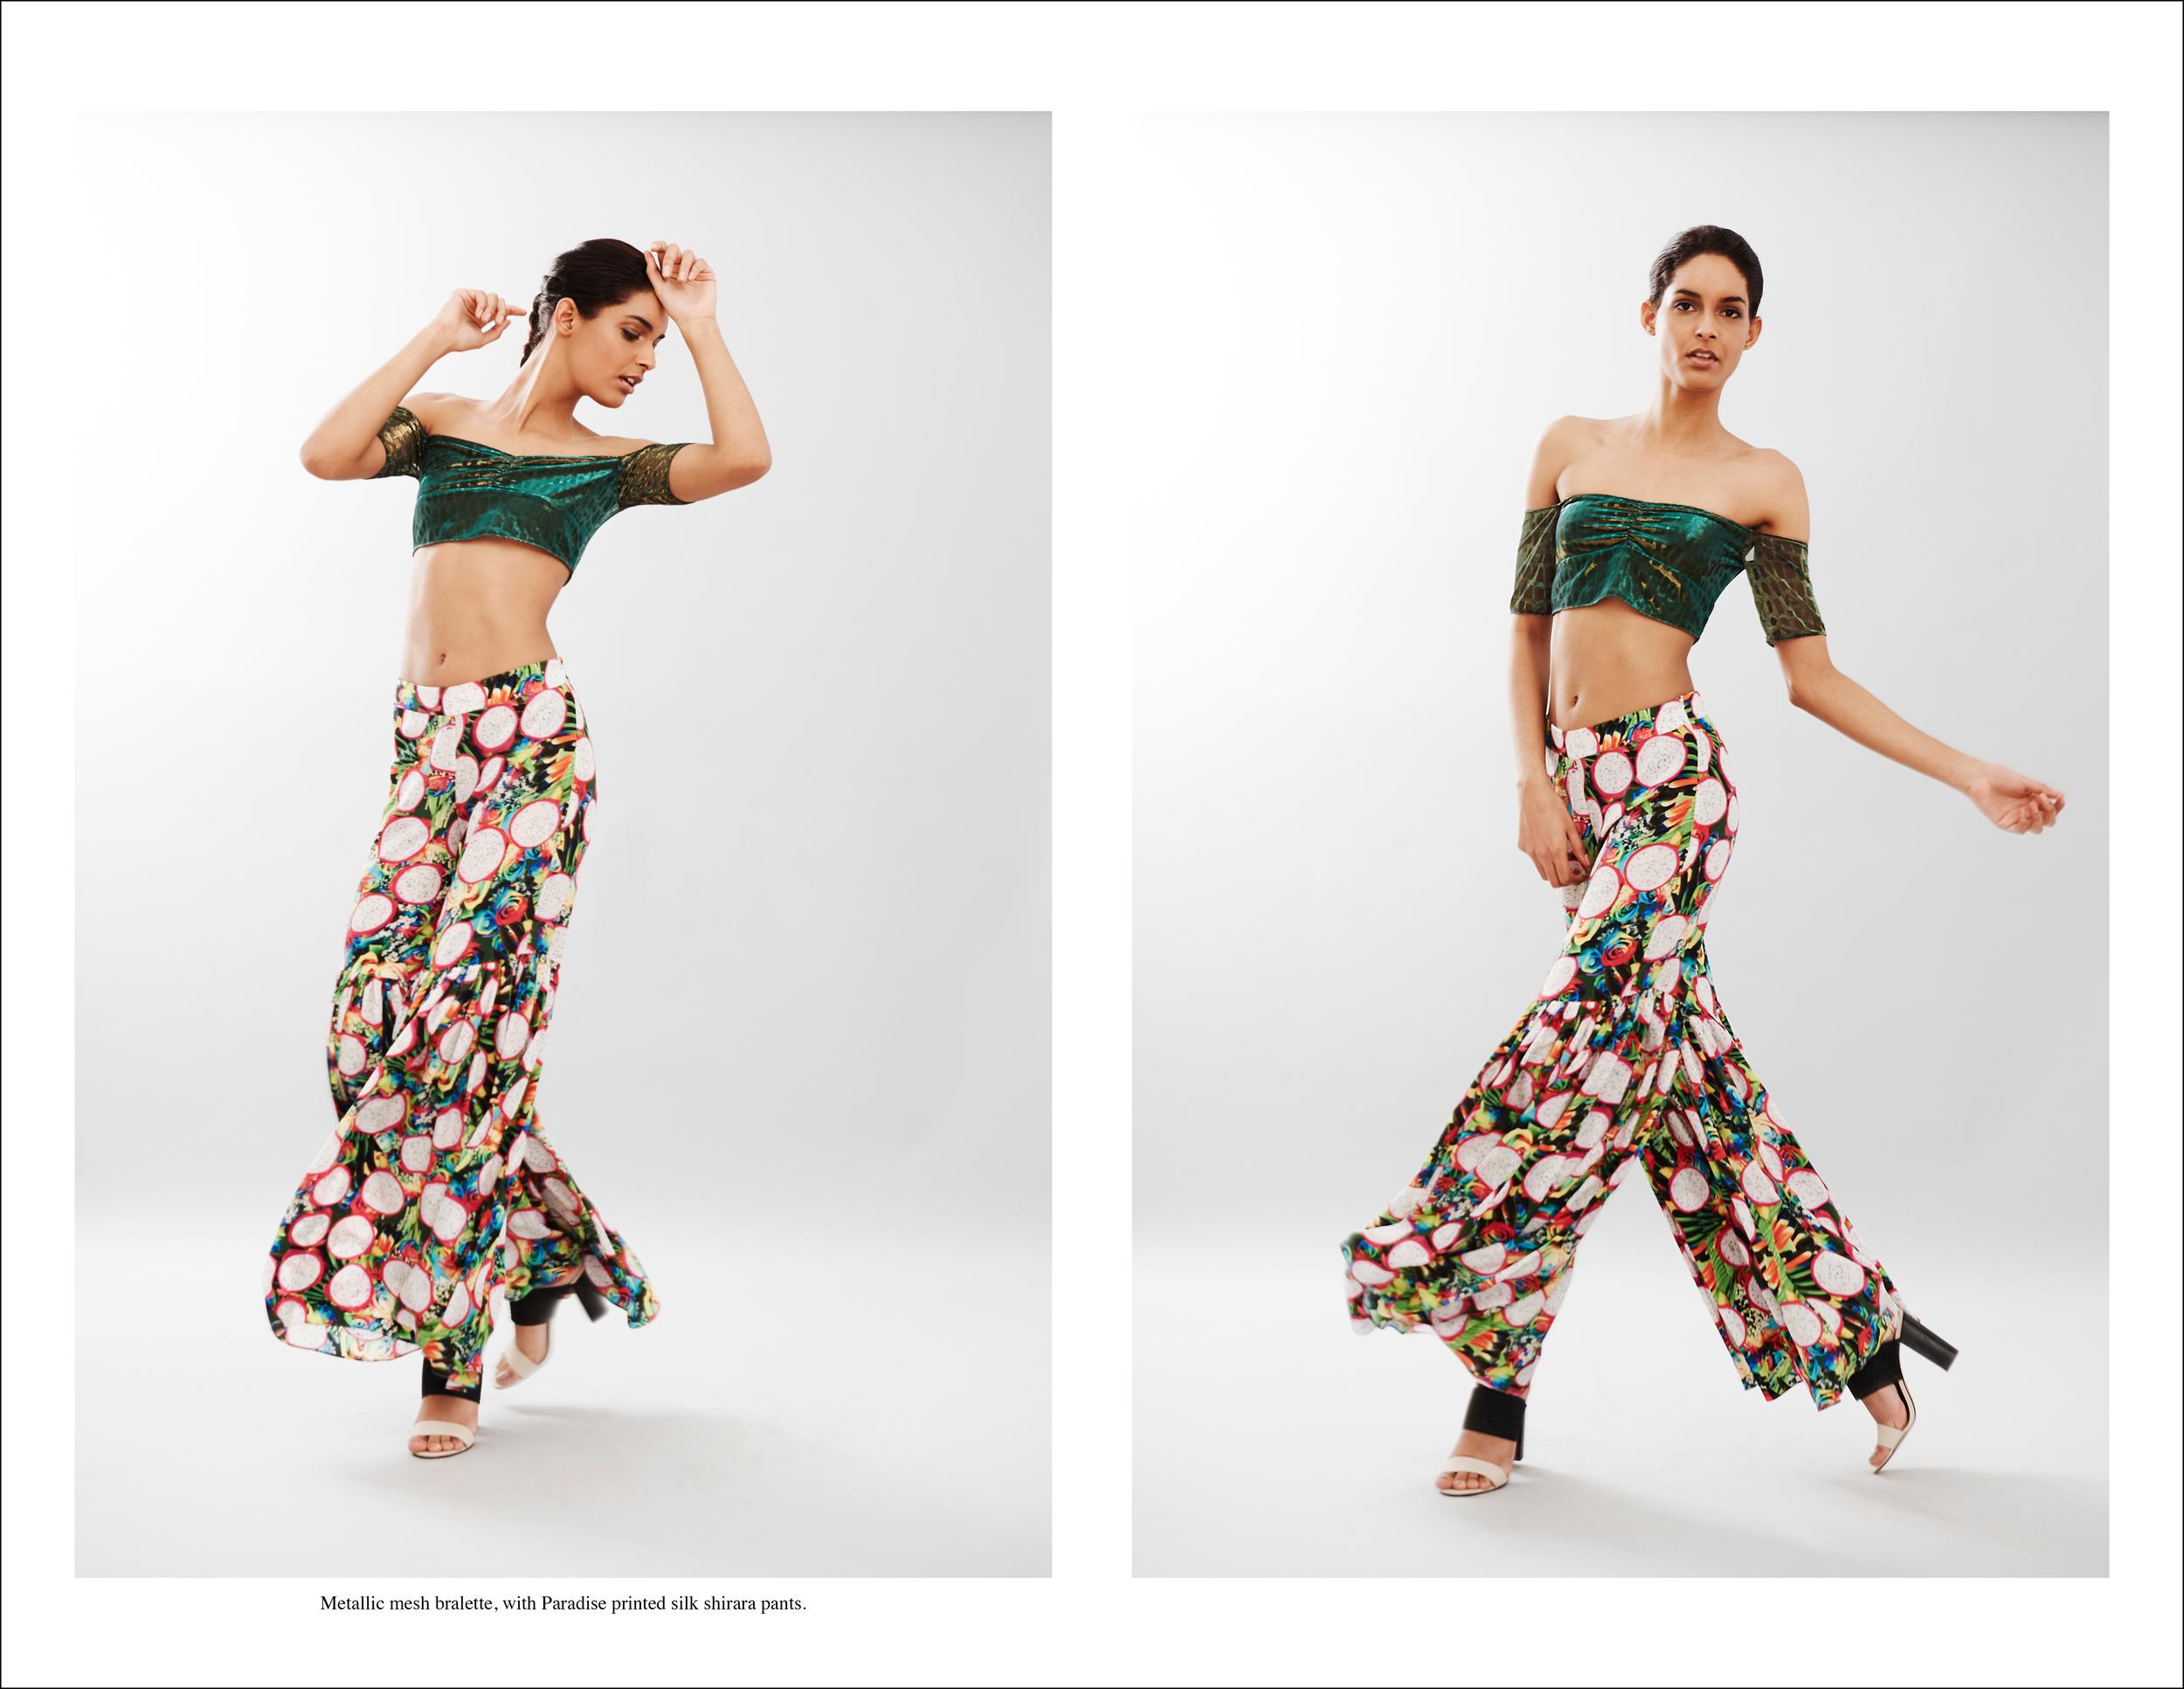 abacaxi Metallic mesh bralette, with Paradise printed silk shirara pants.jpg